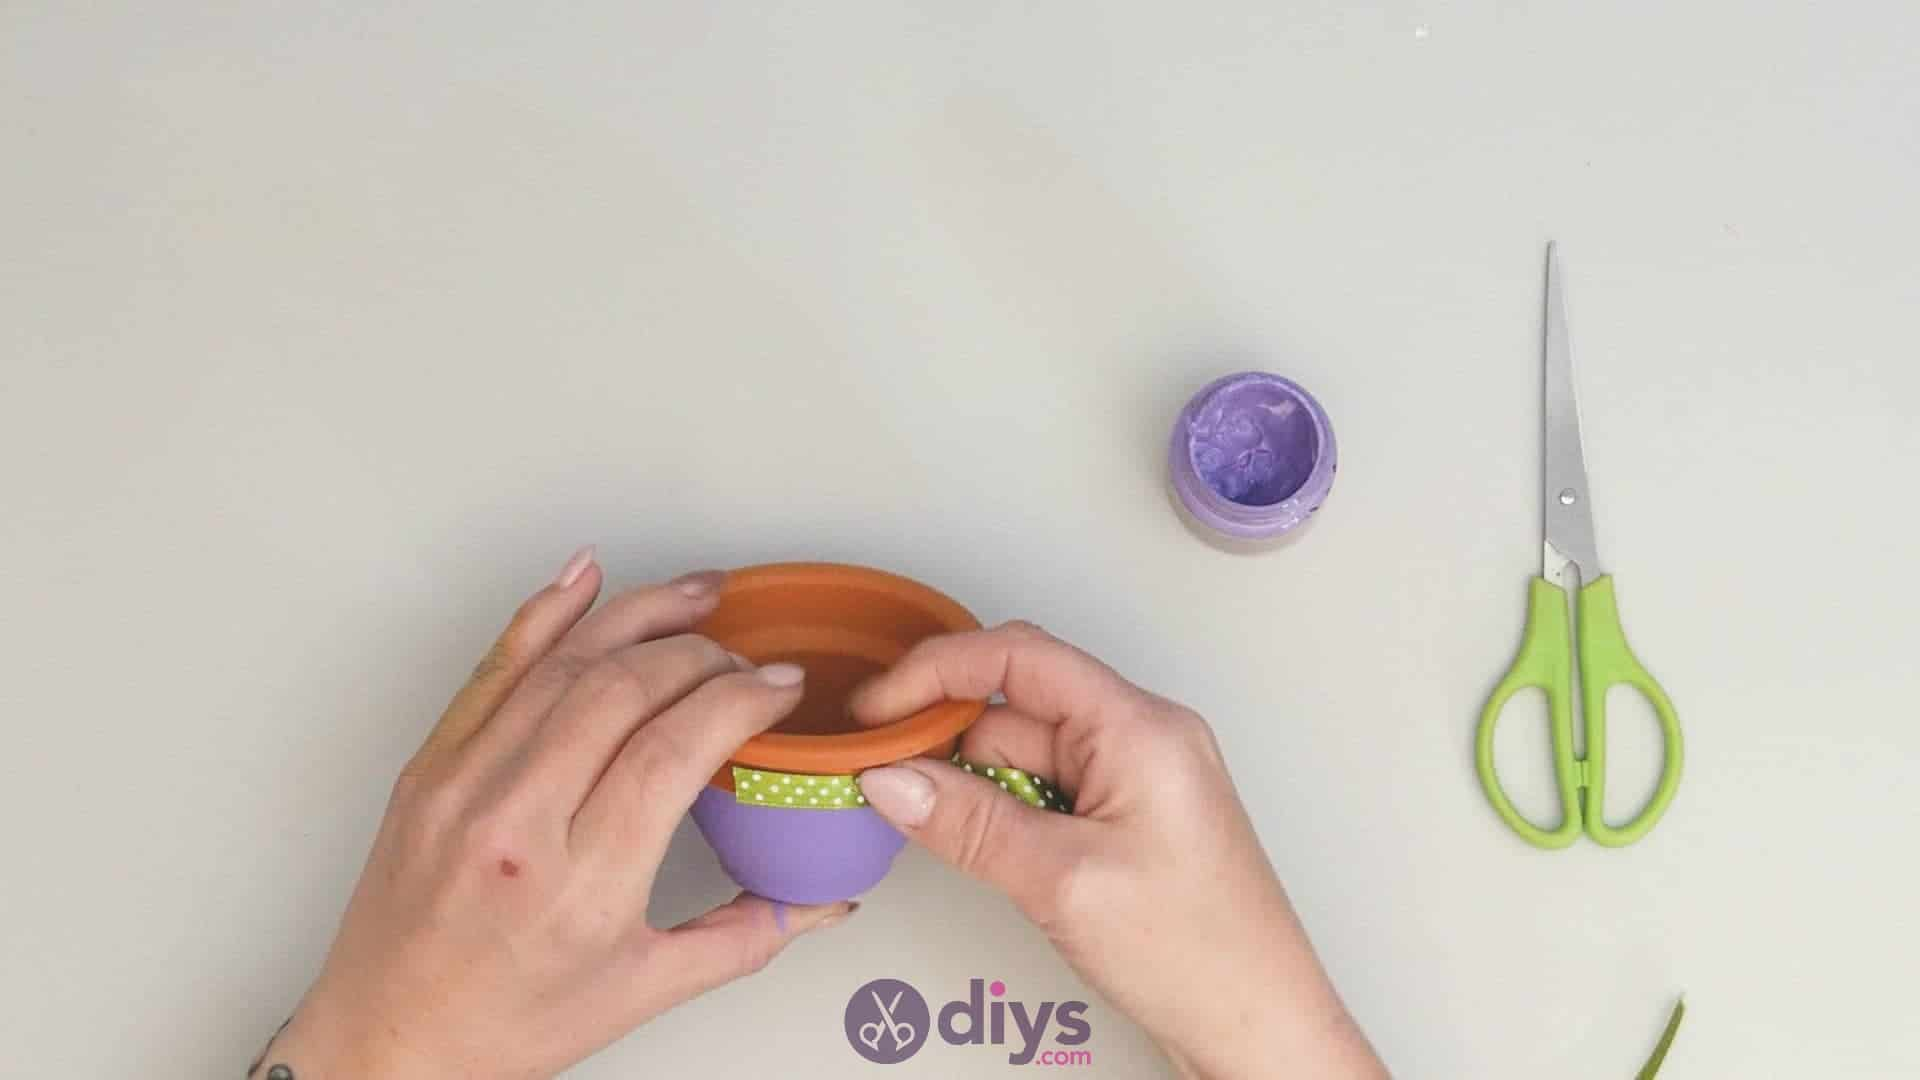 Diy colourful flower pot step 3a